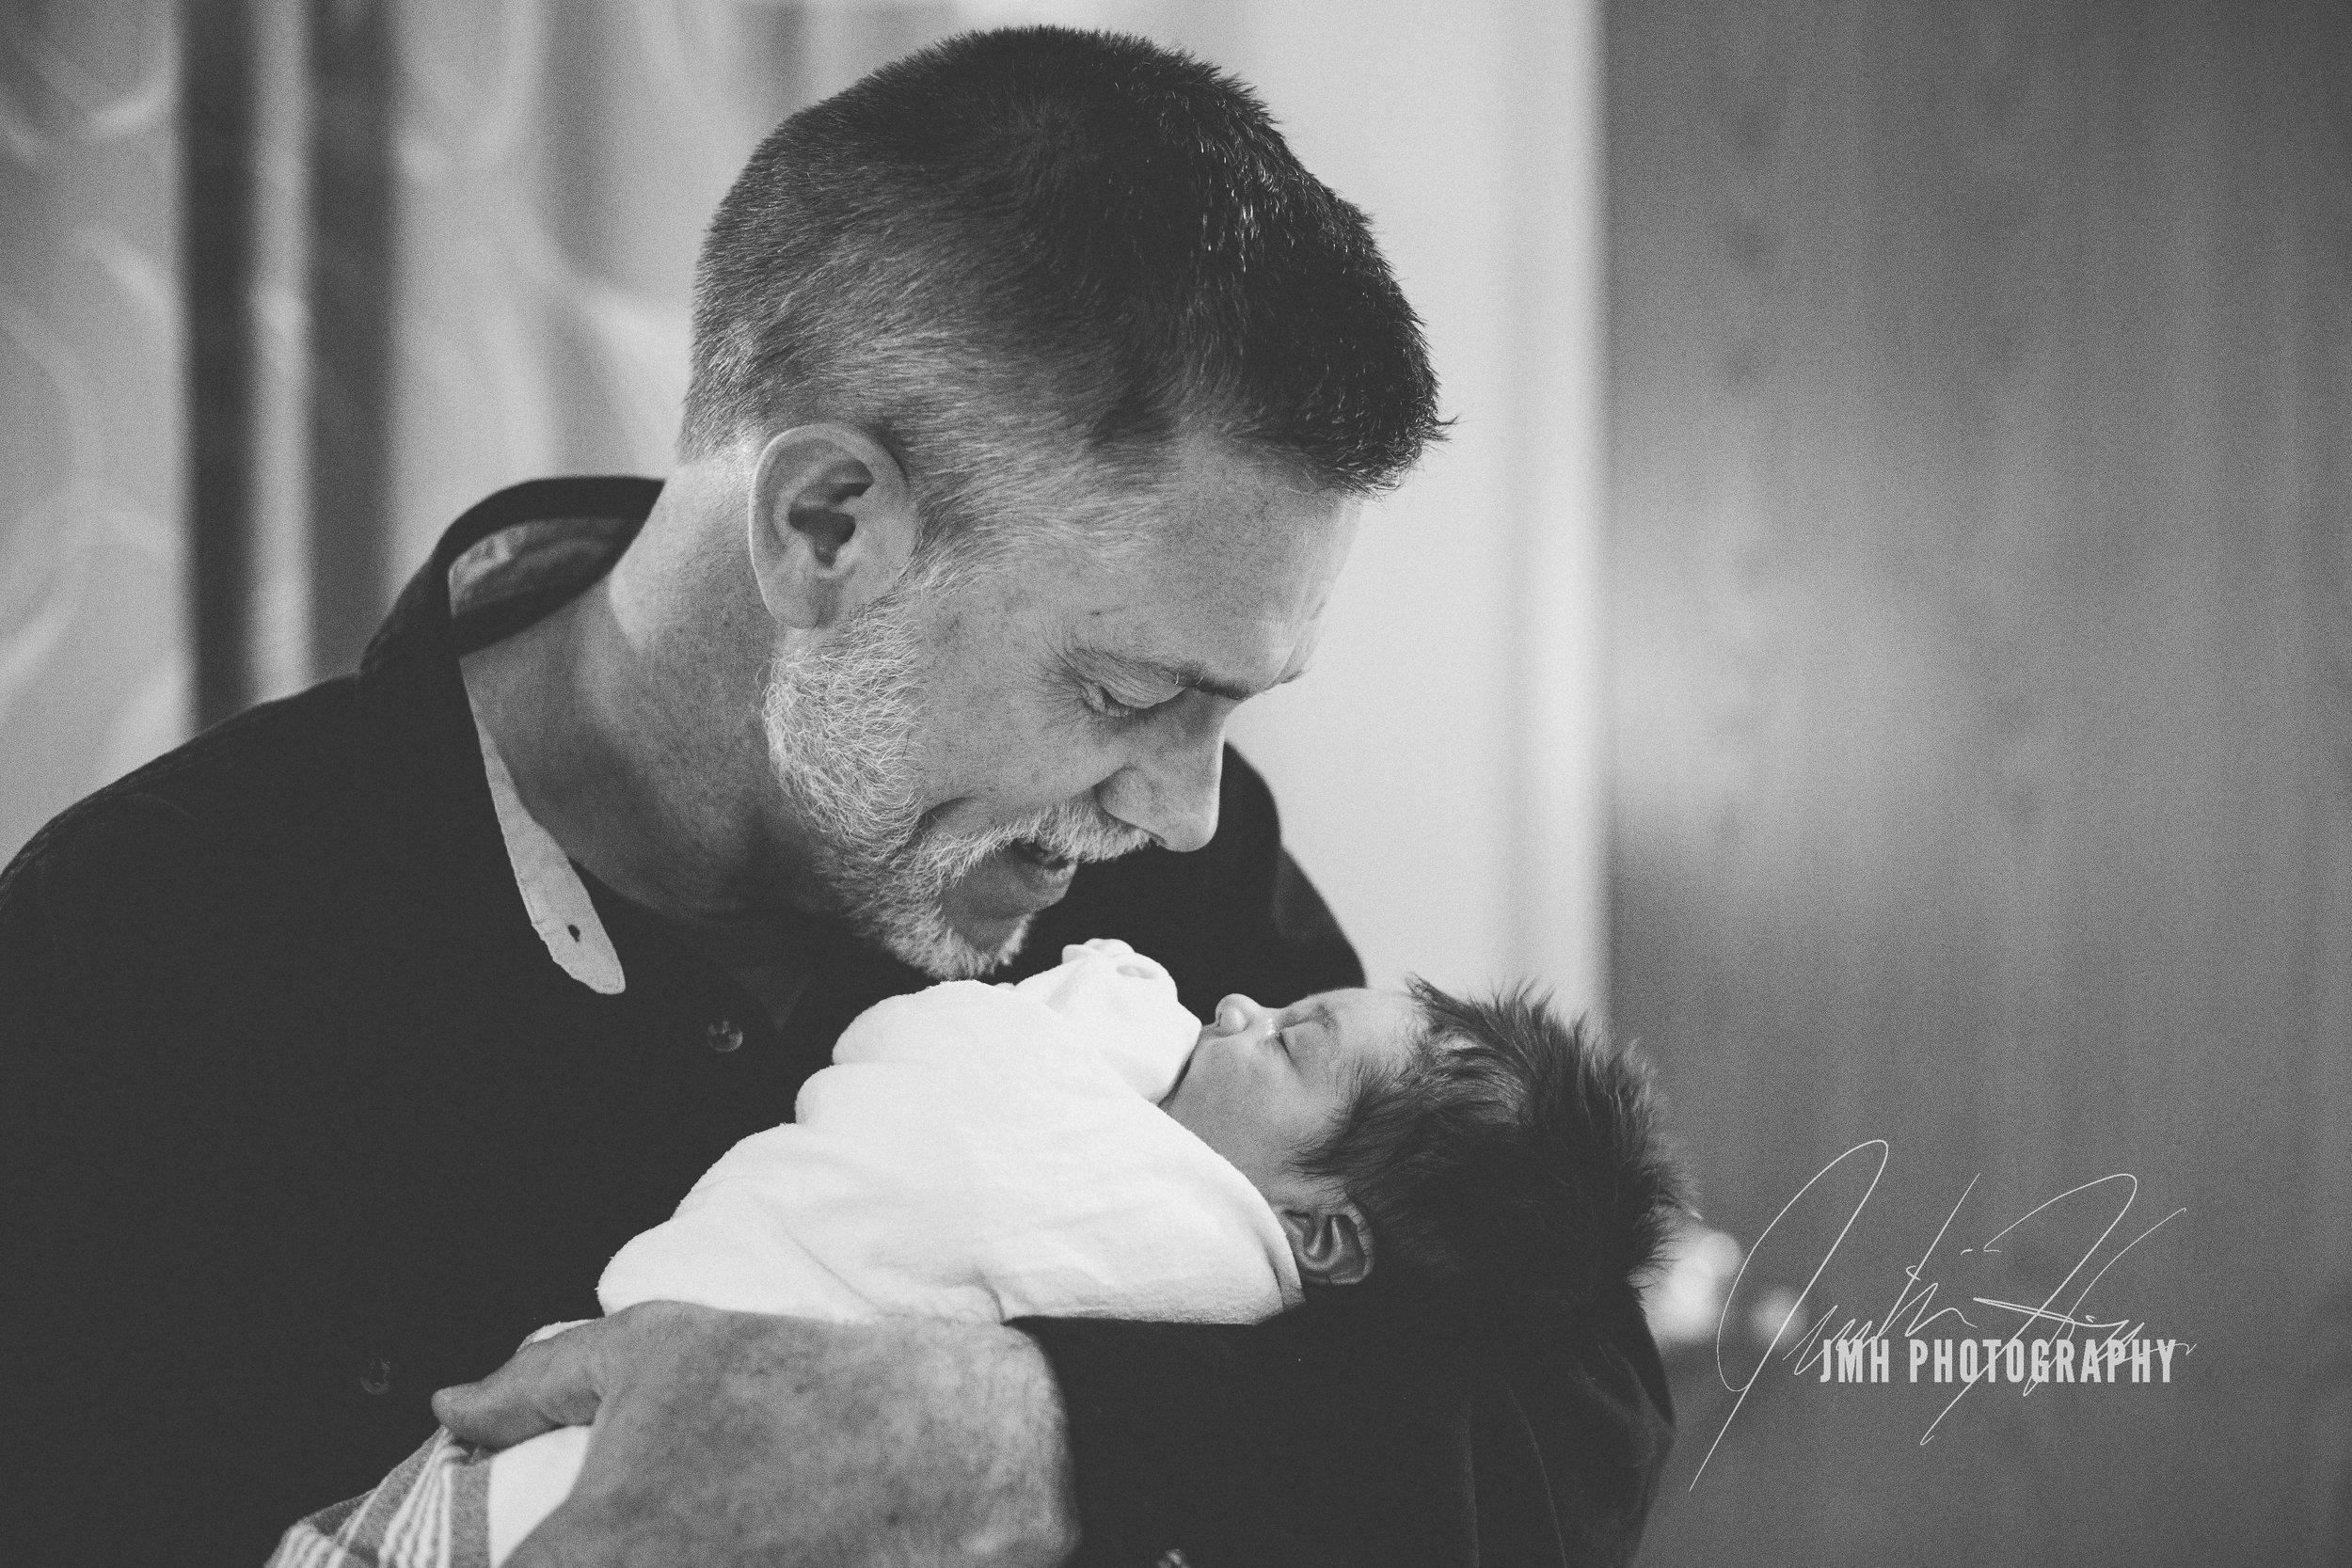 grandrapids_birth_photography-44.jpg